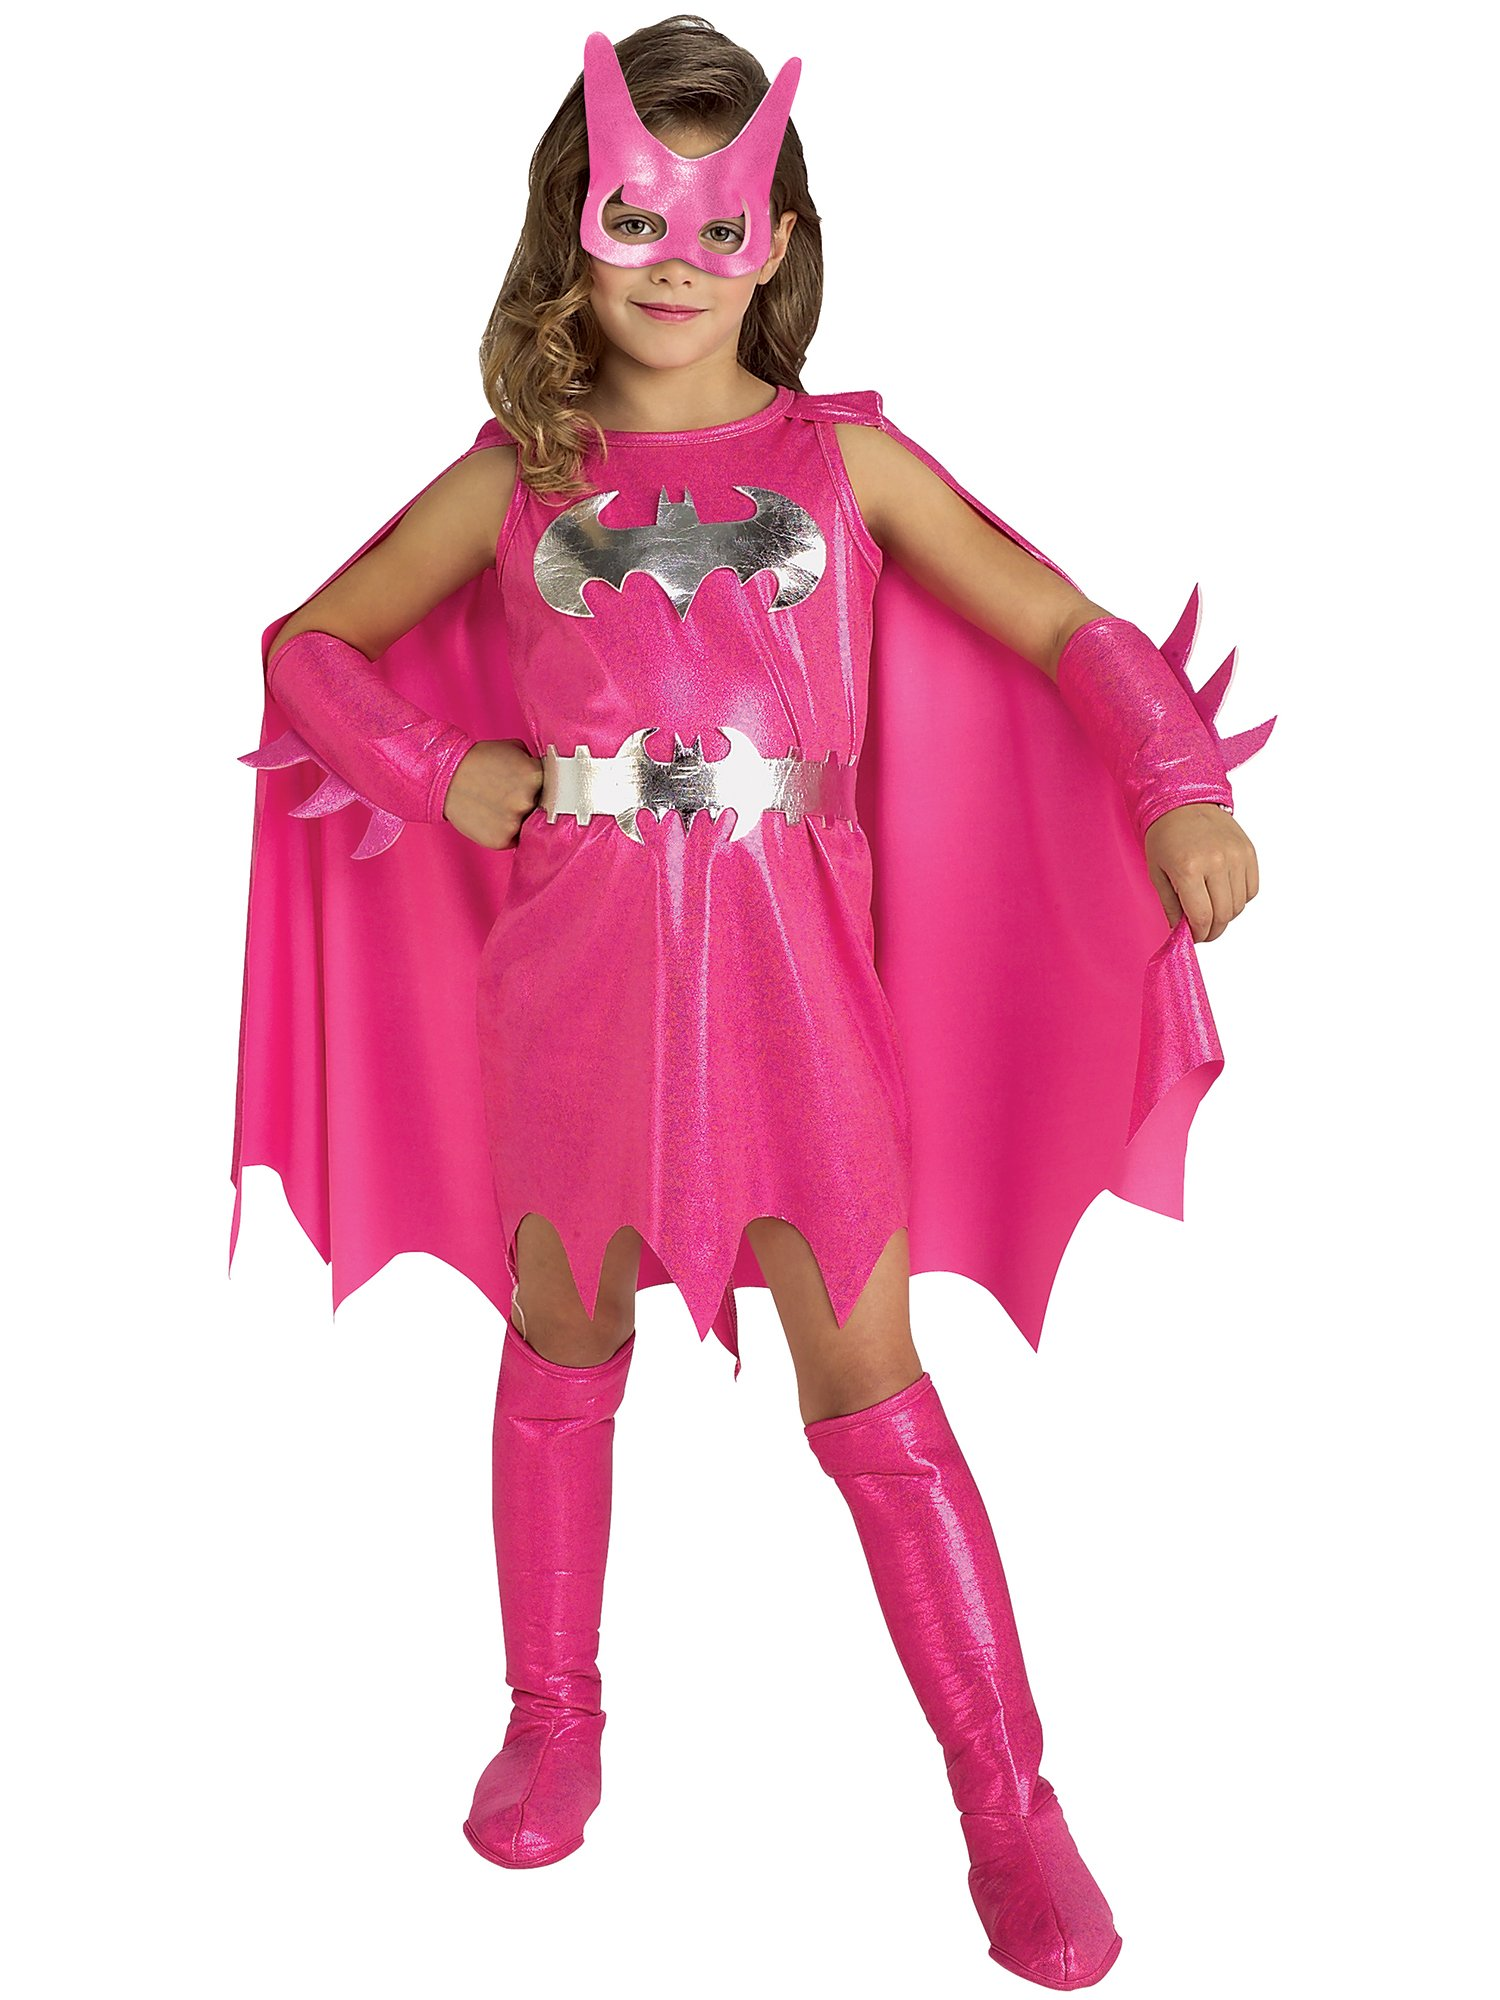 - 8146aJ0eqVL - Batgirl Child Costume in Pink